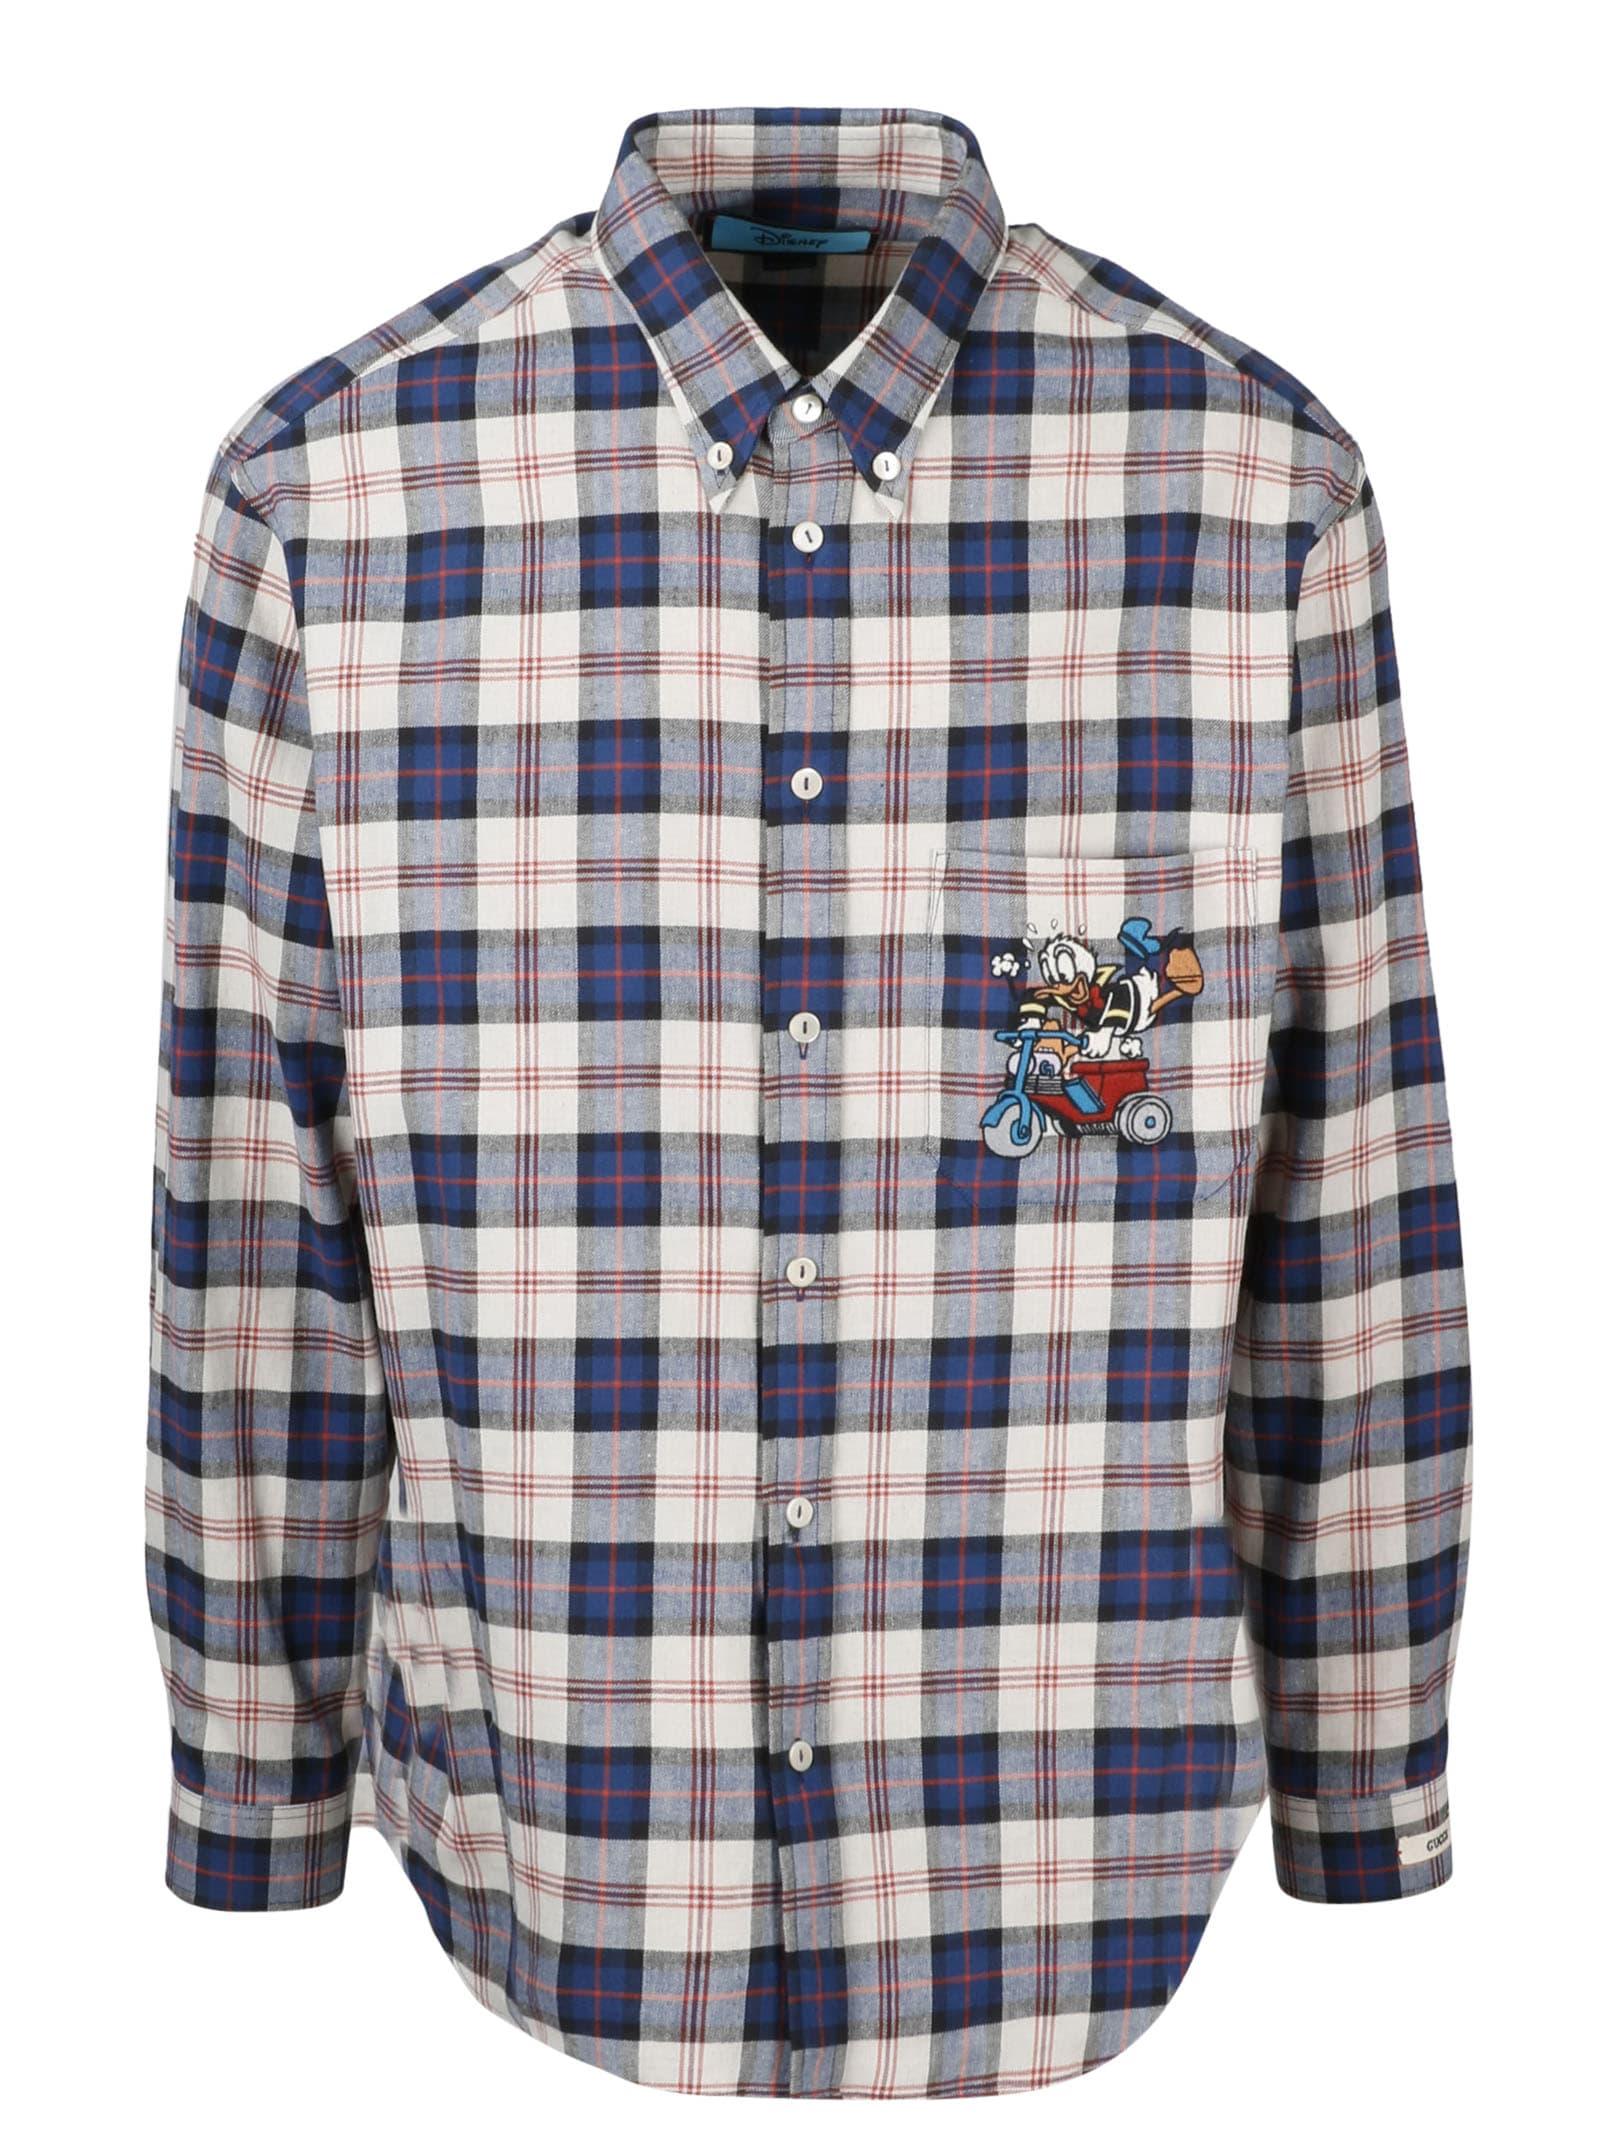 Gucci Donald Duck Disney X Shirt